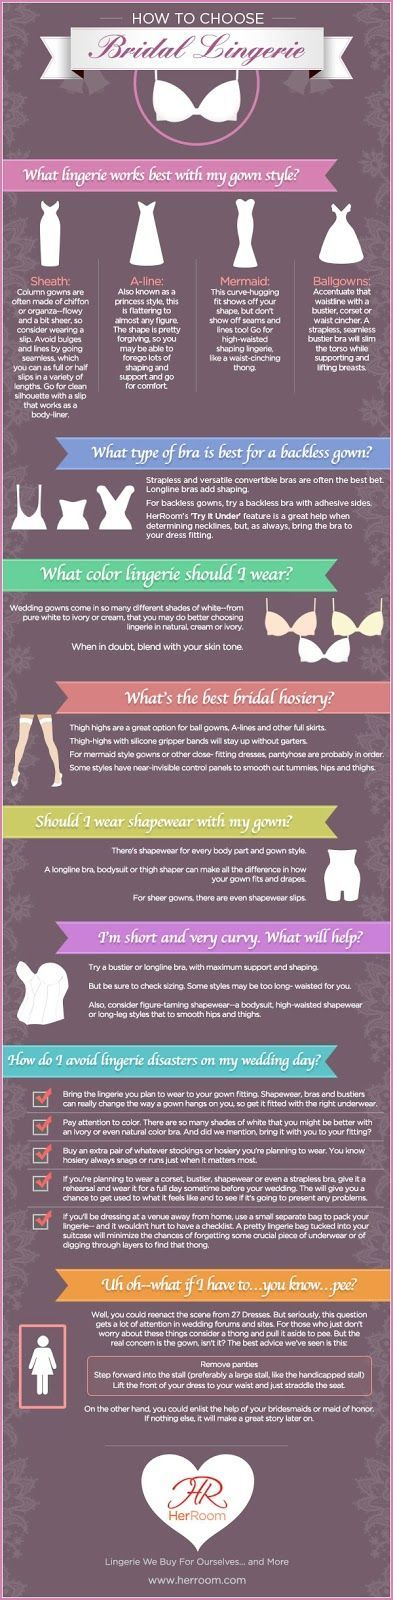 How to Choose The Perfect Bridal Lingerie  #bridallingerie - womens lace lingerie, womens lingerie, woman's lingerie *sponsored https://www.pinterest.com/lingerie_yes/ https://www.pinterest.com/explore/lingerie/ https://www.pinterest.com/lingerie_yes/teen-lingerie/ https://lonelylabel.com/t/categories/lonely/bras